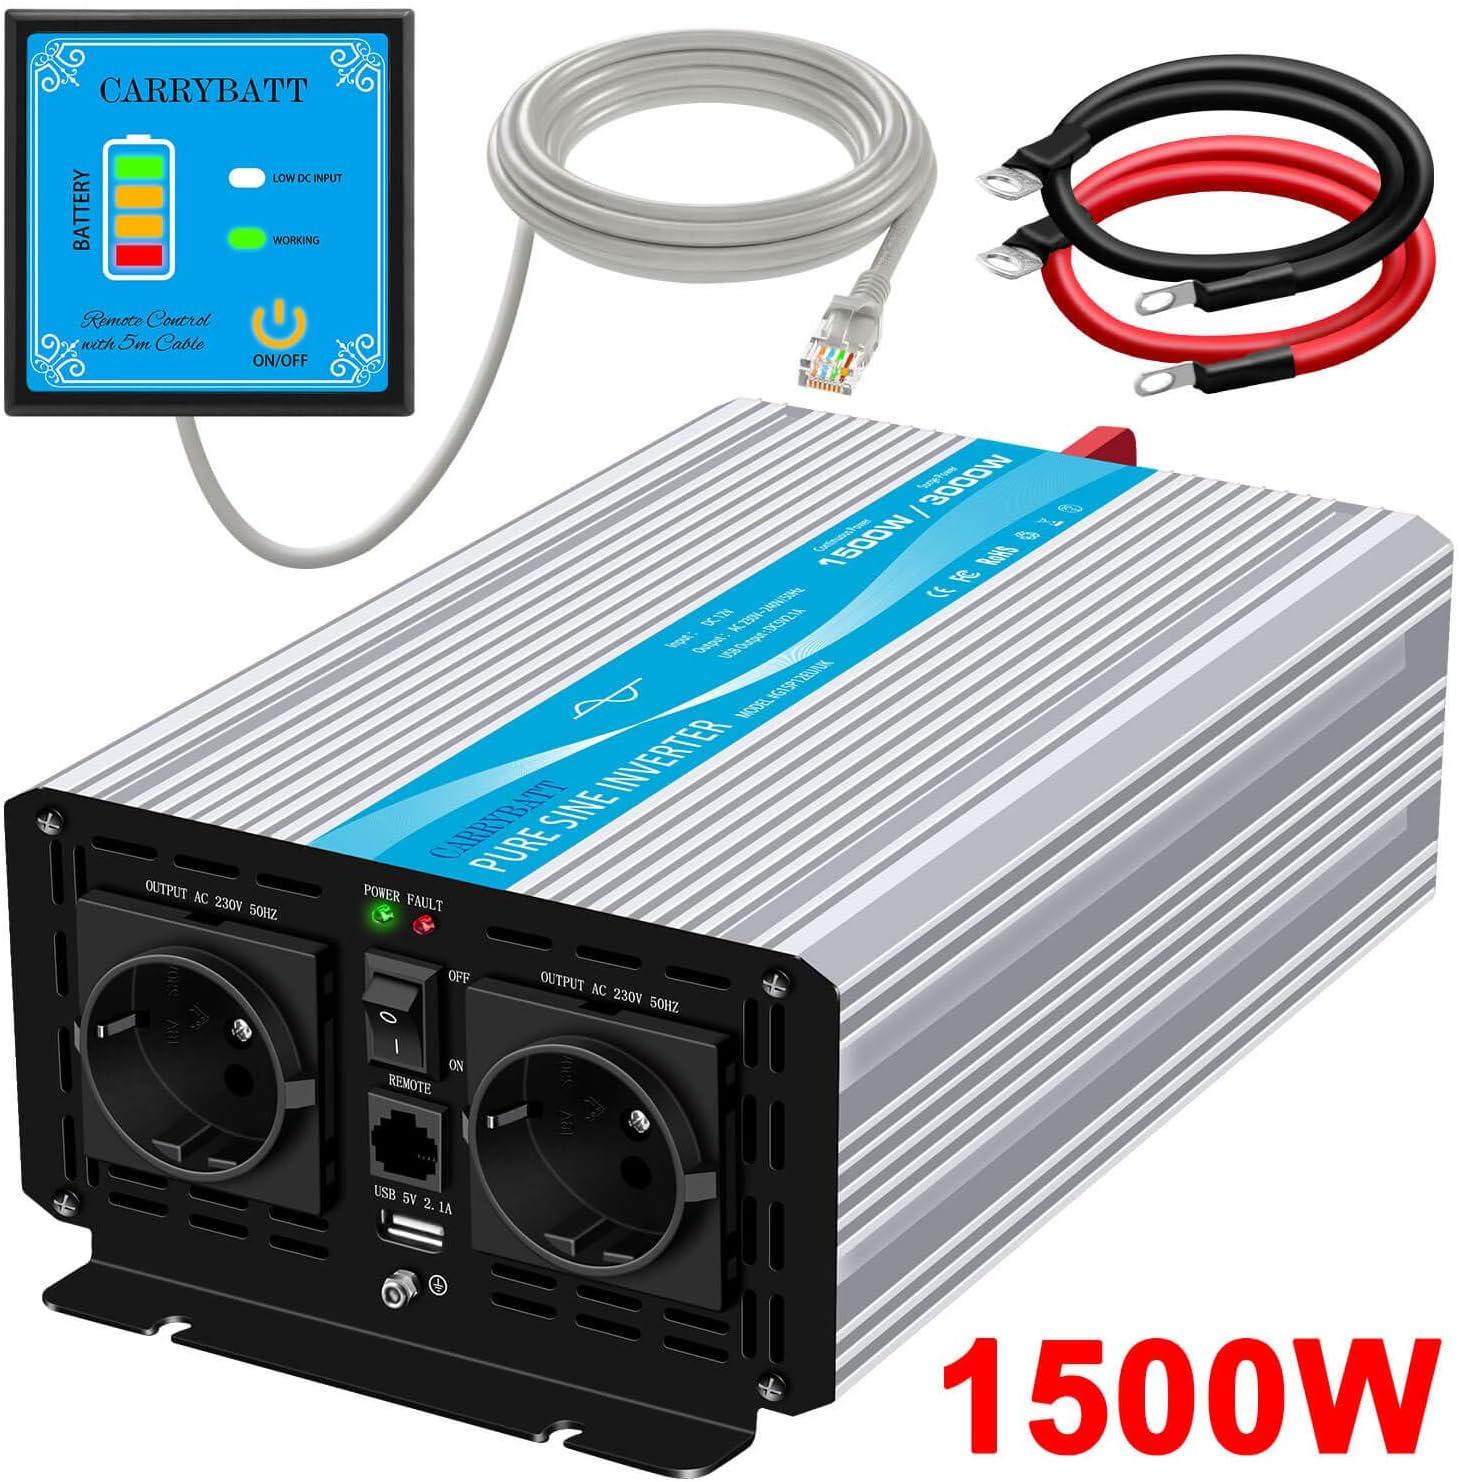 CARRYBATT Inversor de Corriente de Onda sinusoidal Pura 1500W/3000W Convertidor DC 12V a AC 220V 230V con Mando a Distancia & Salidas de AC duales y Puerto USB